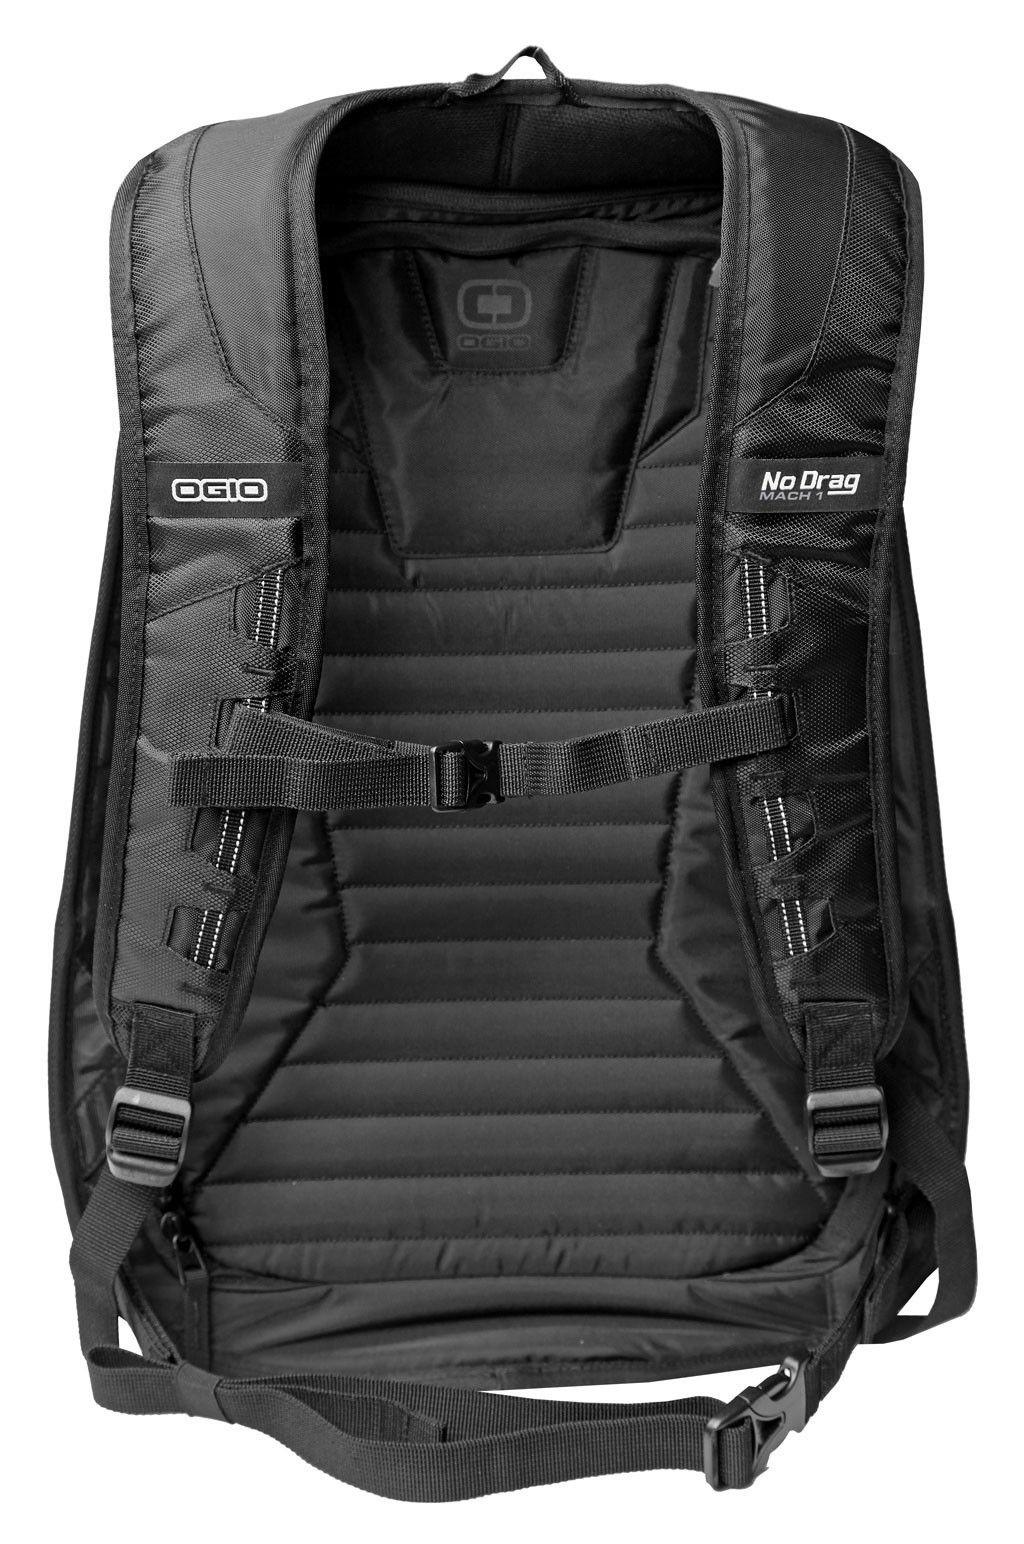 Ogio Mach 5 >> Ogio No Drag Mach 3 Backpack Revzilla